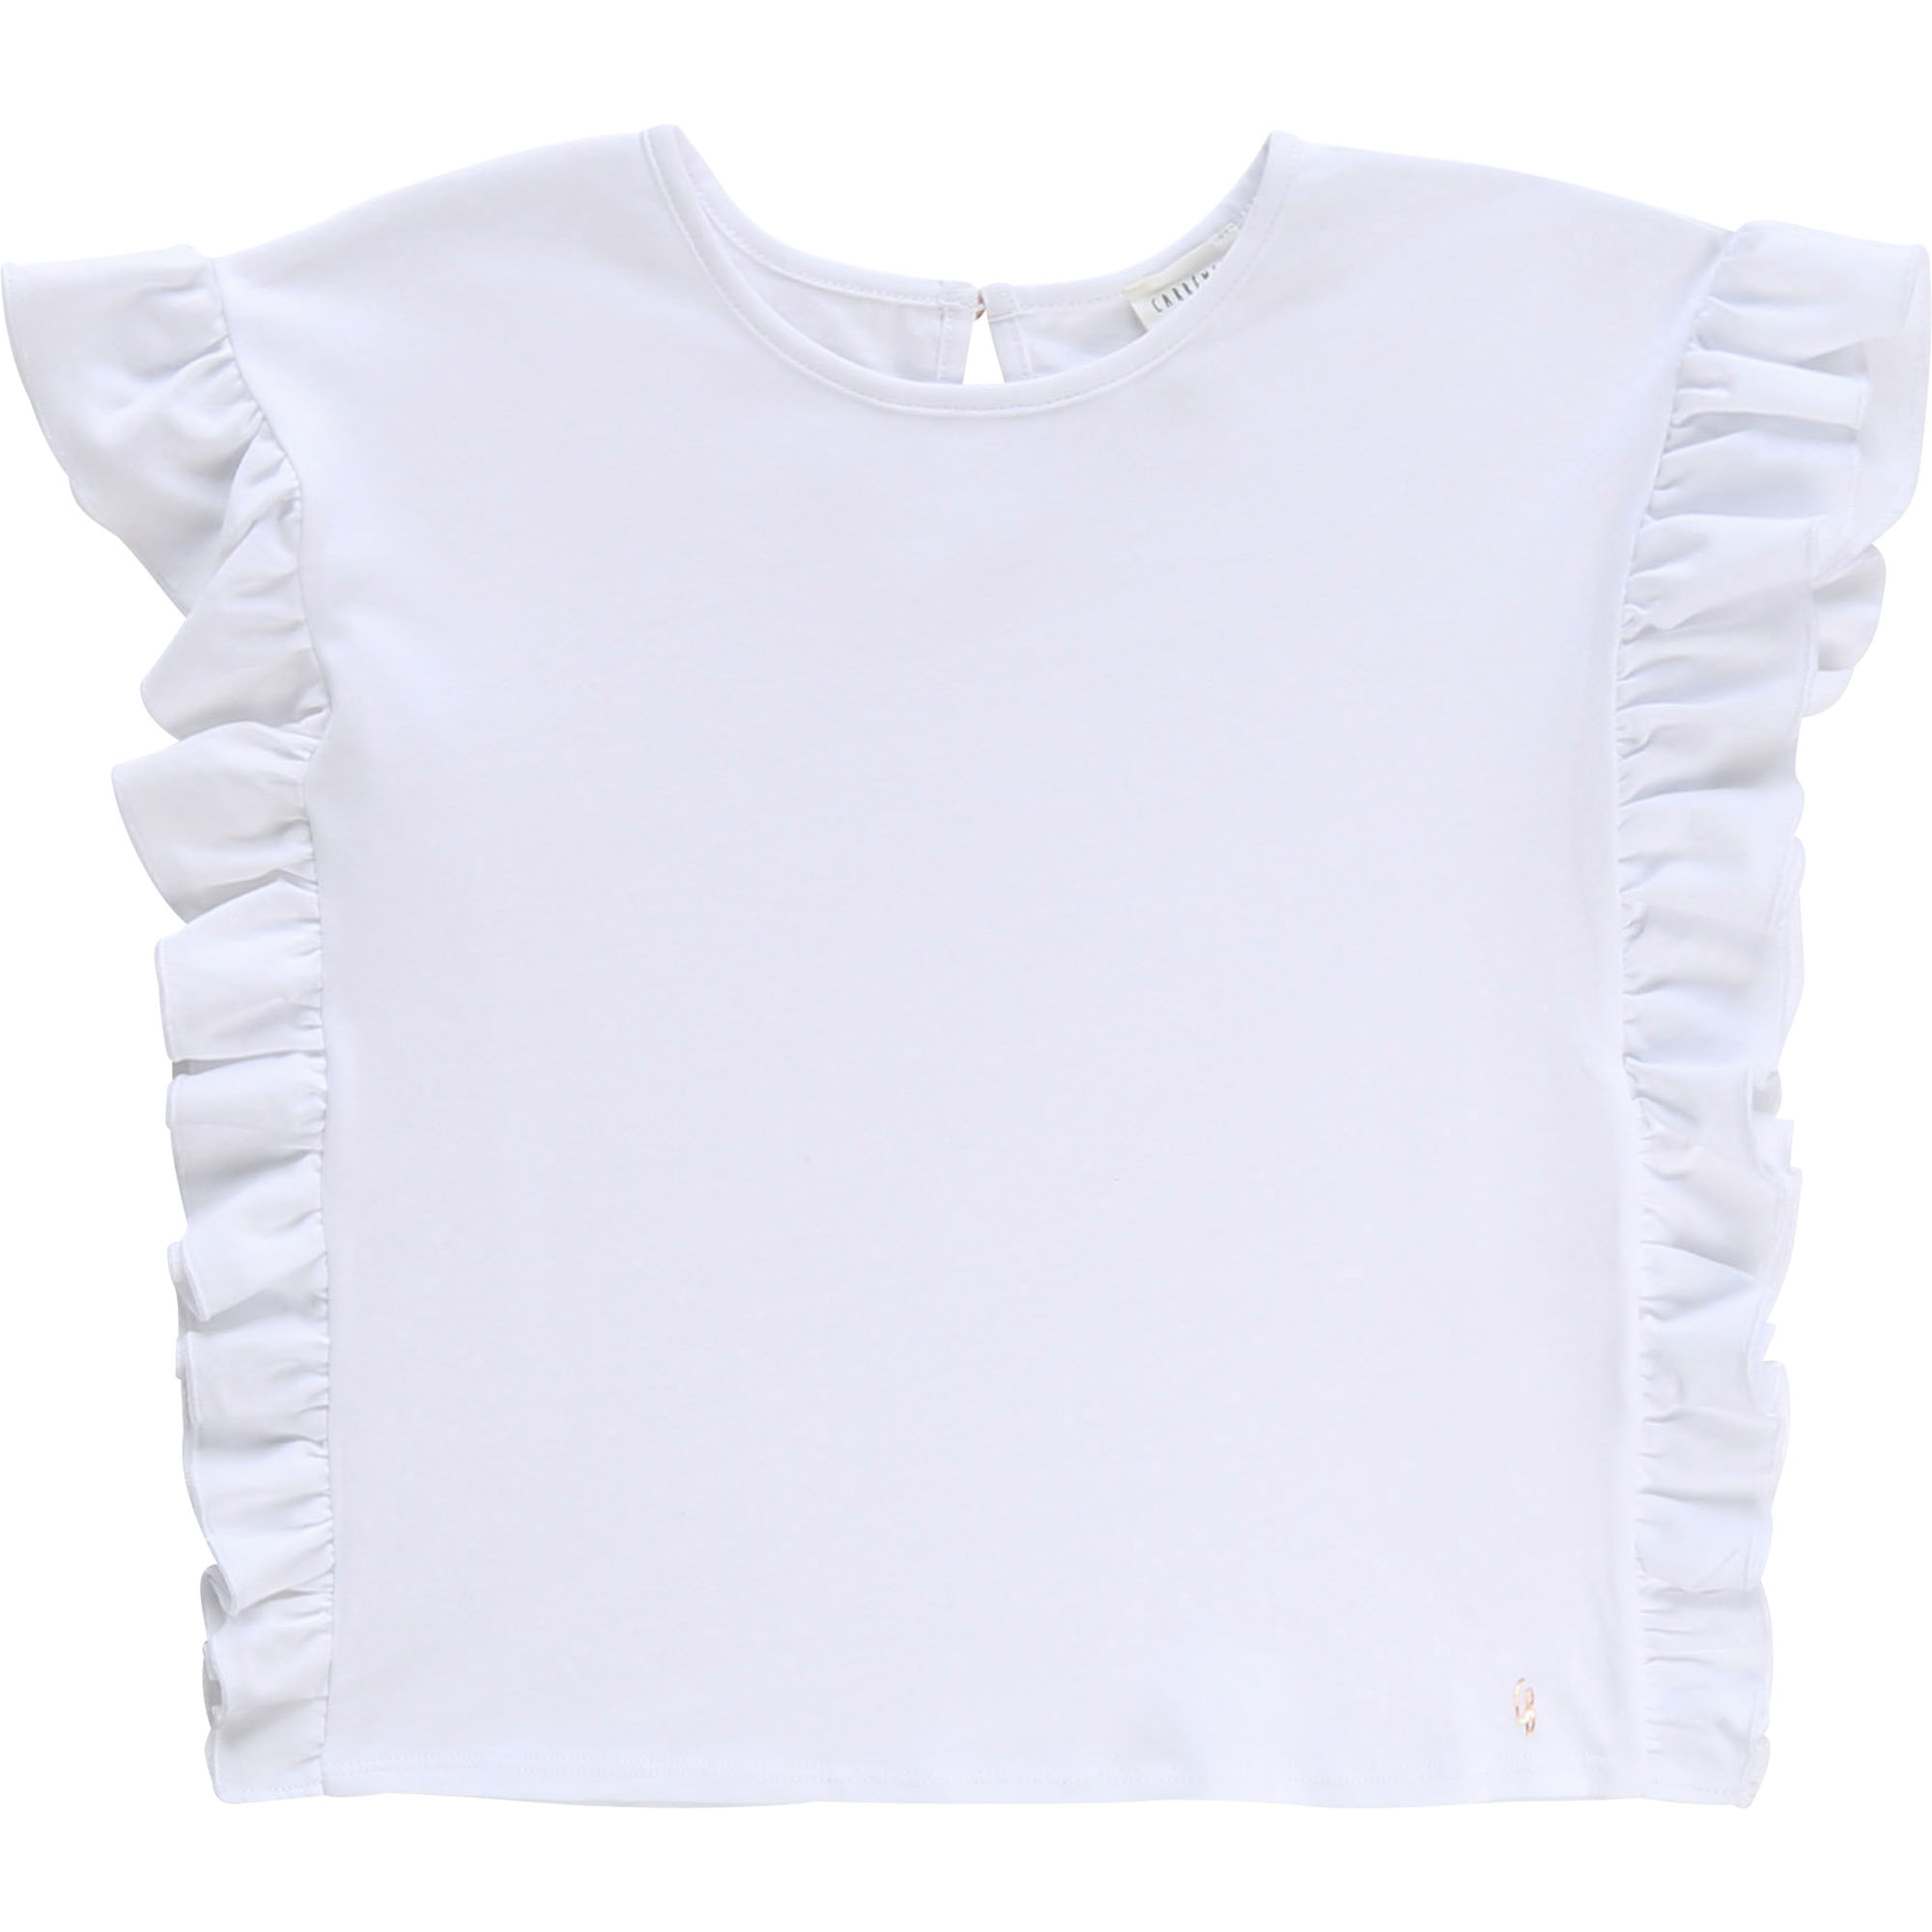 Carrement Beau lyhythihainen paita koko 102 cm ALE -50% (OVH 29€)